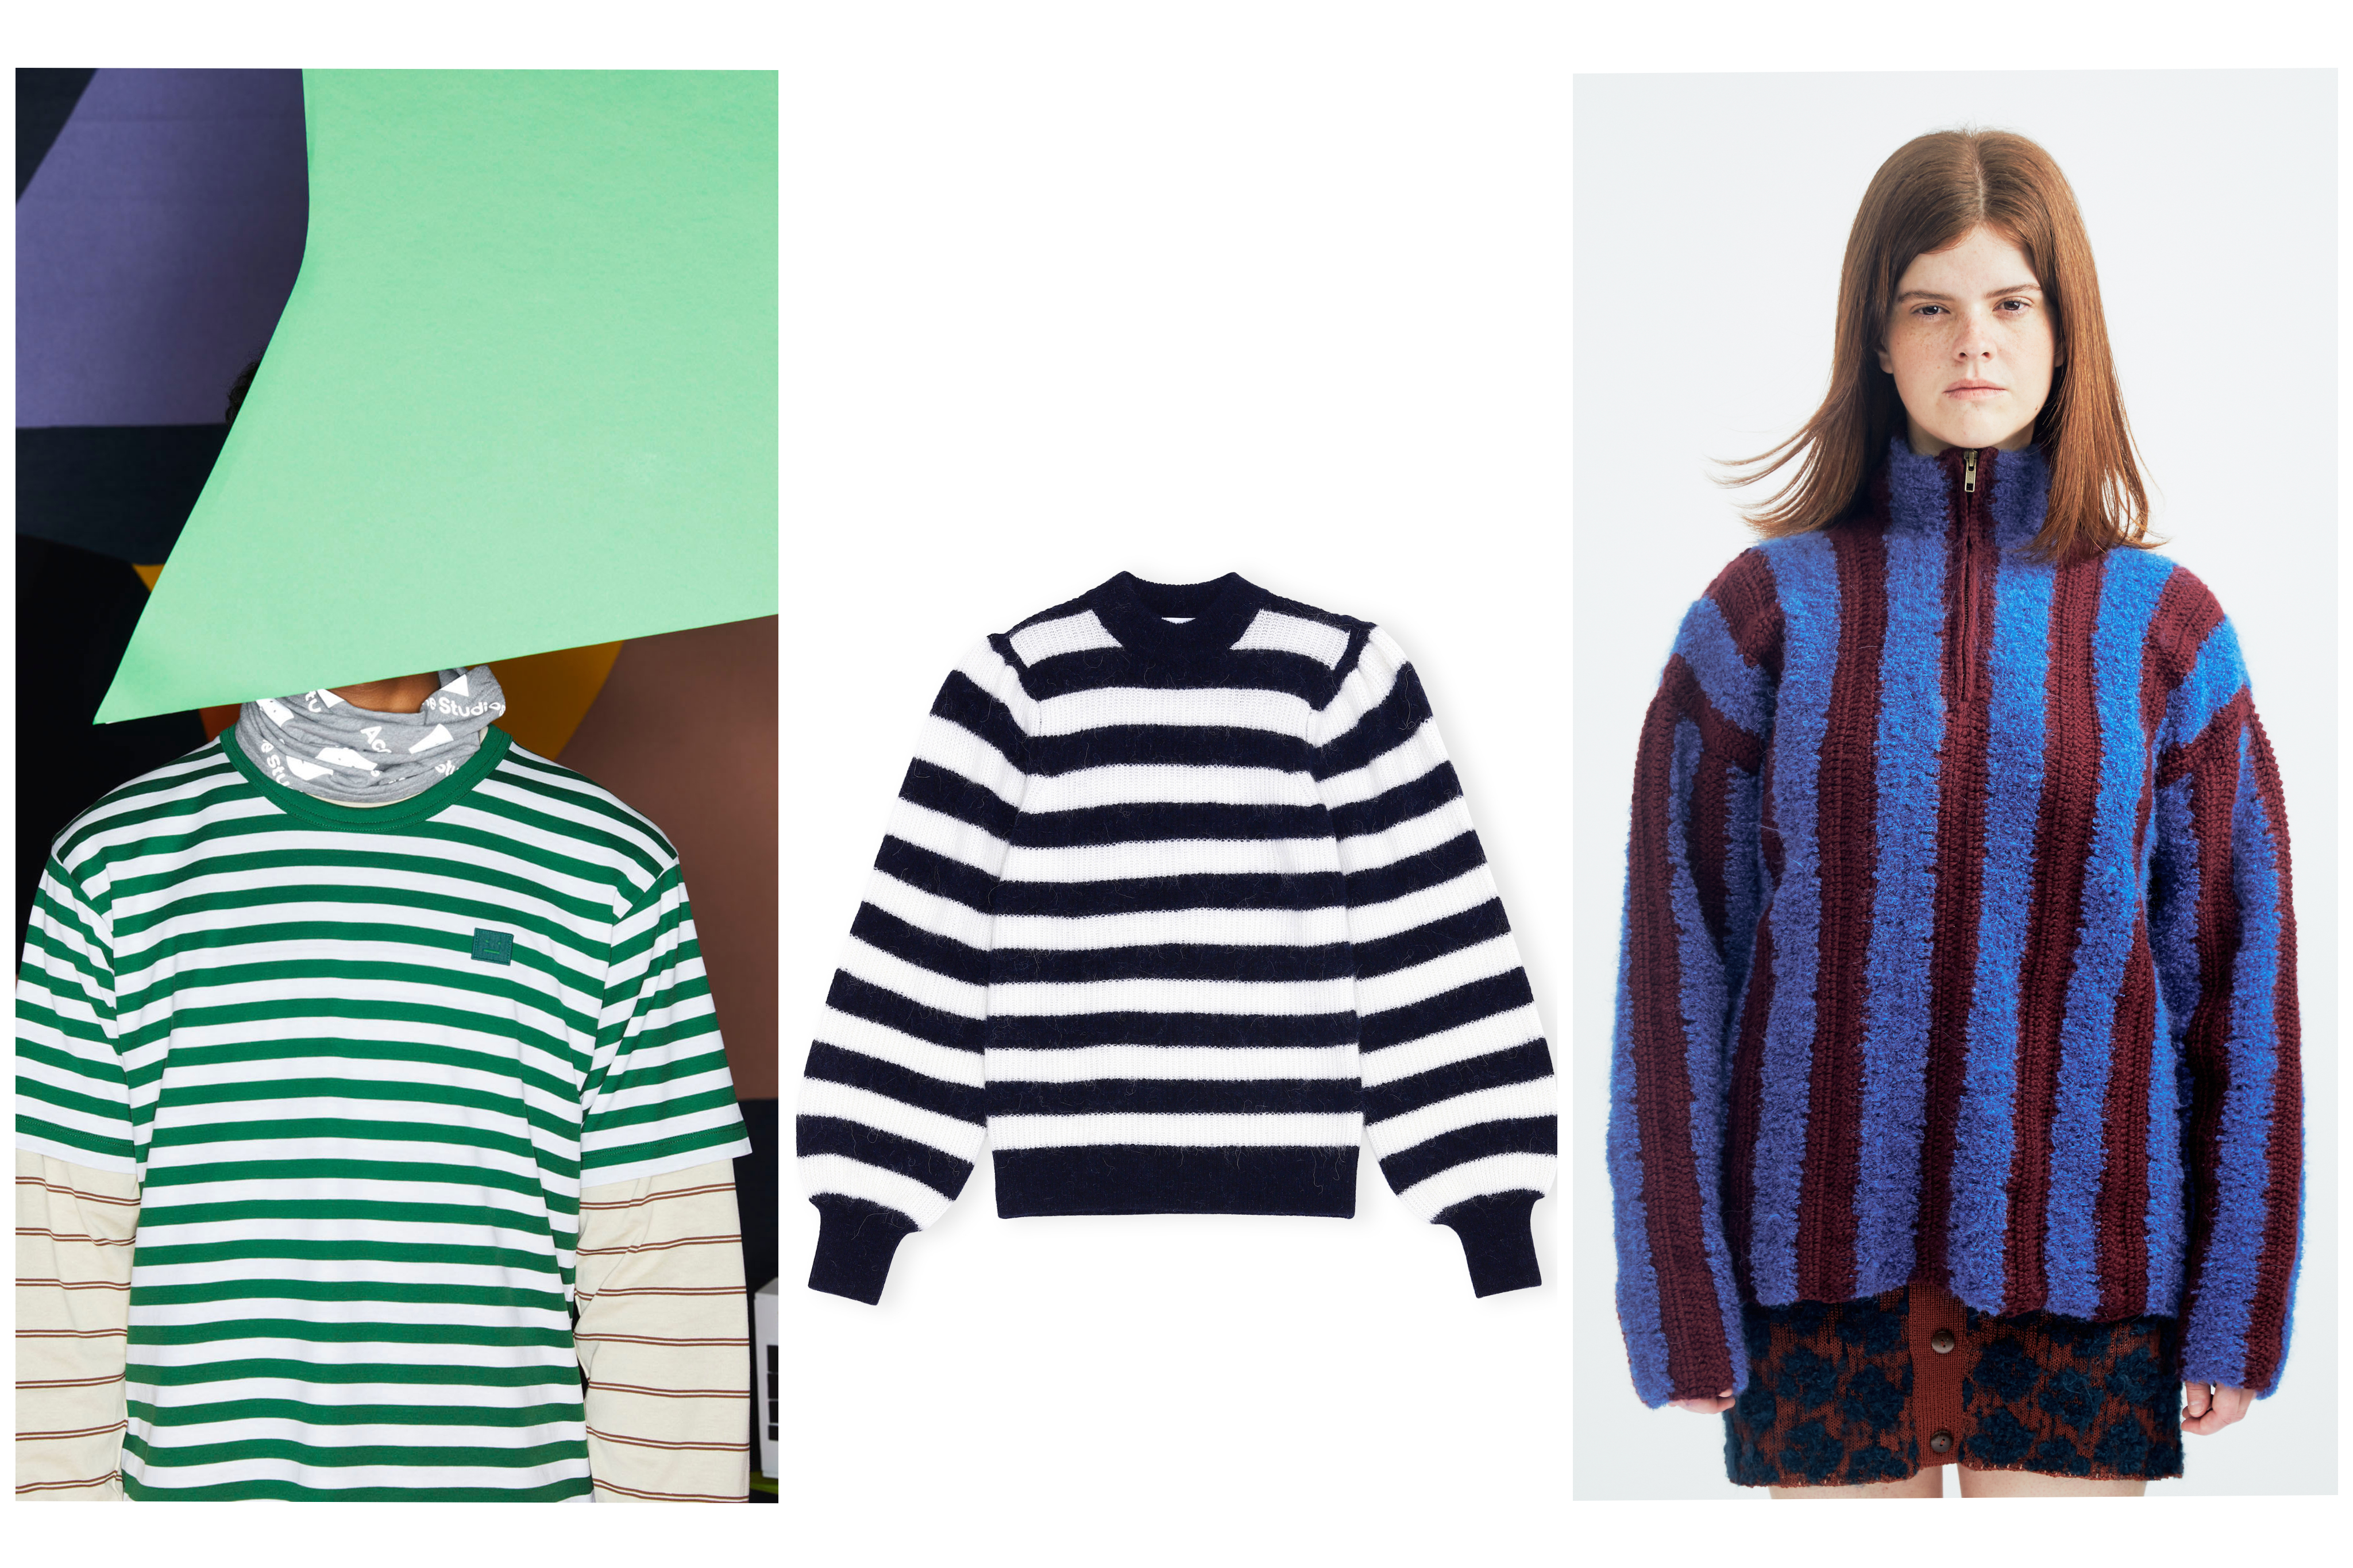 Stripes Emerge As a Fall 8 Fashion Trend From Virtual Press